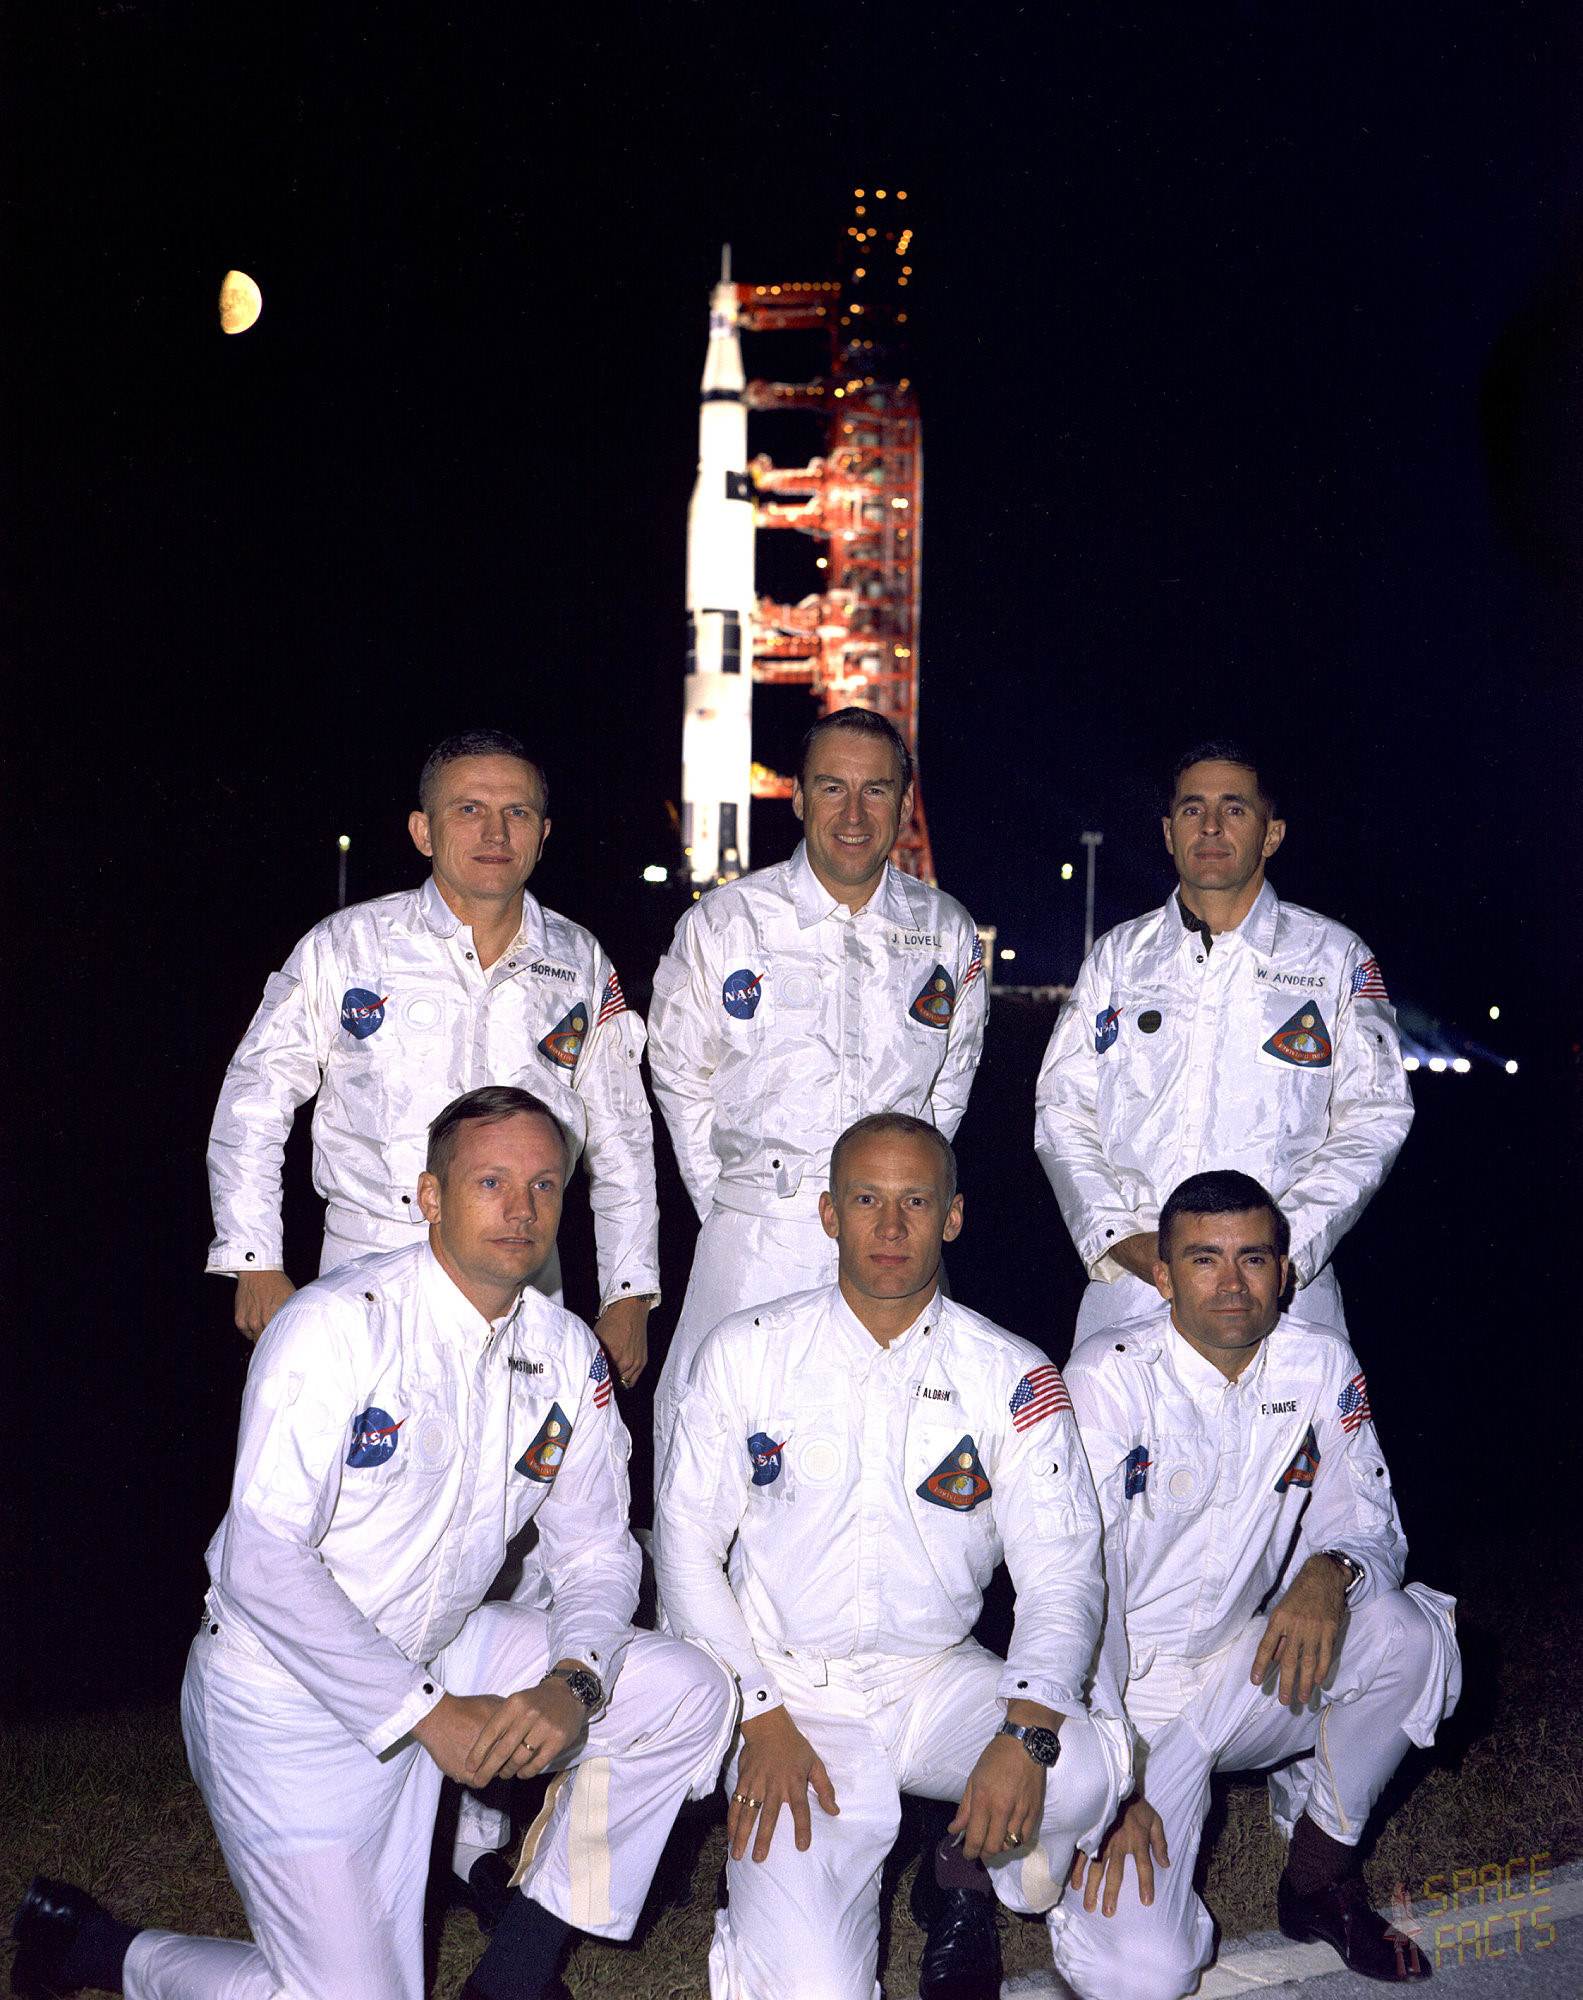 apollo mission crews - photo #15